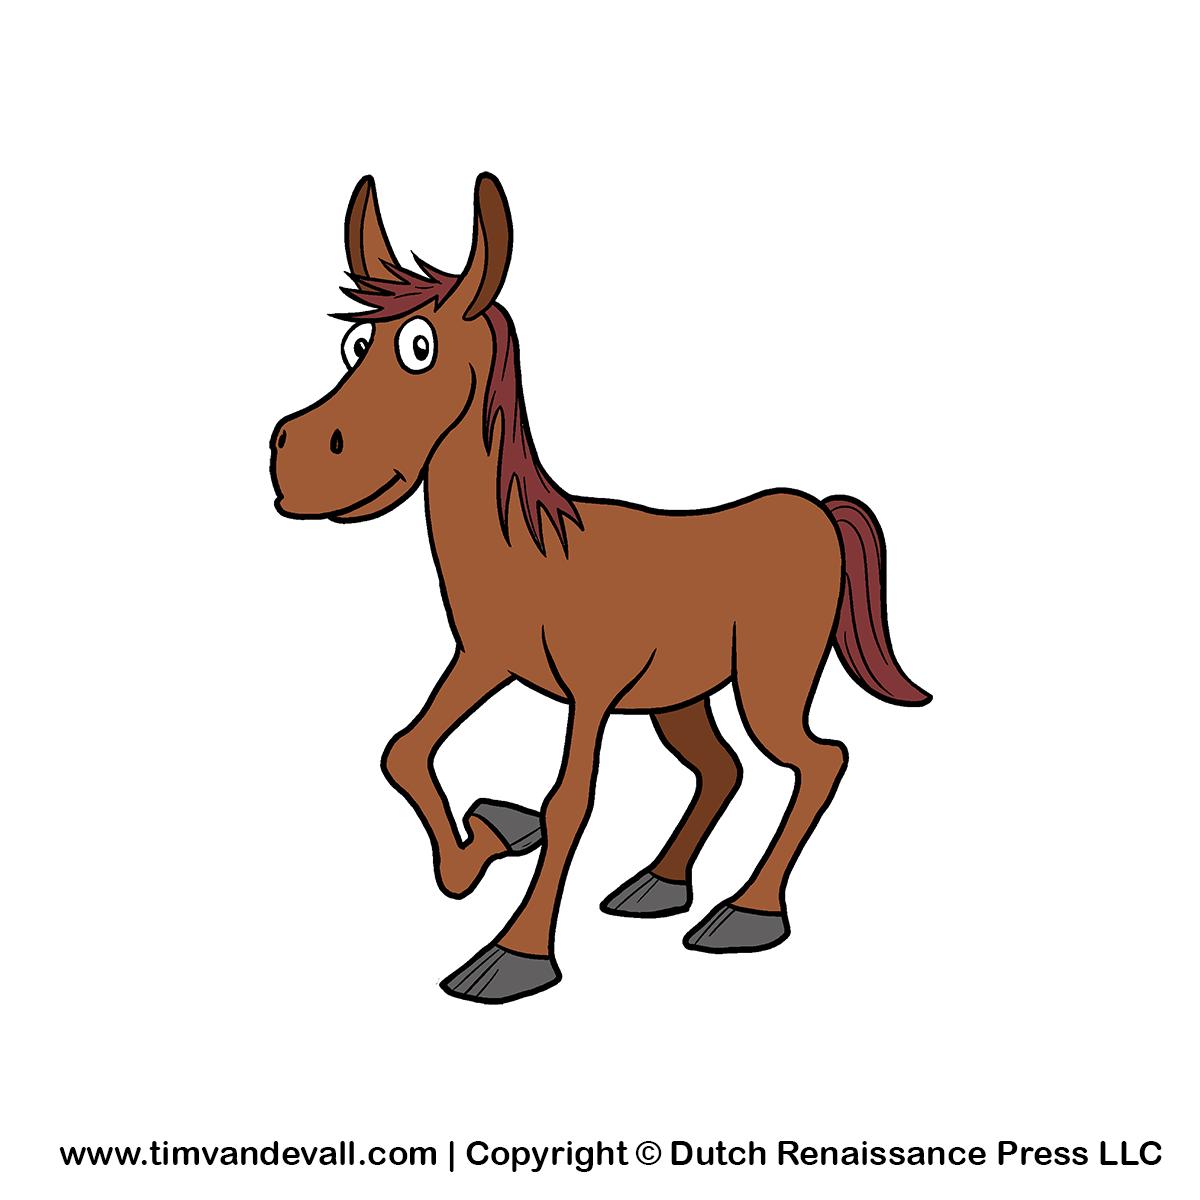 Free cartoon horse clipart for kids | Farm animal clipart